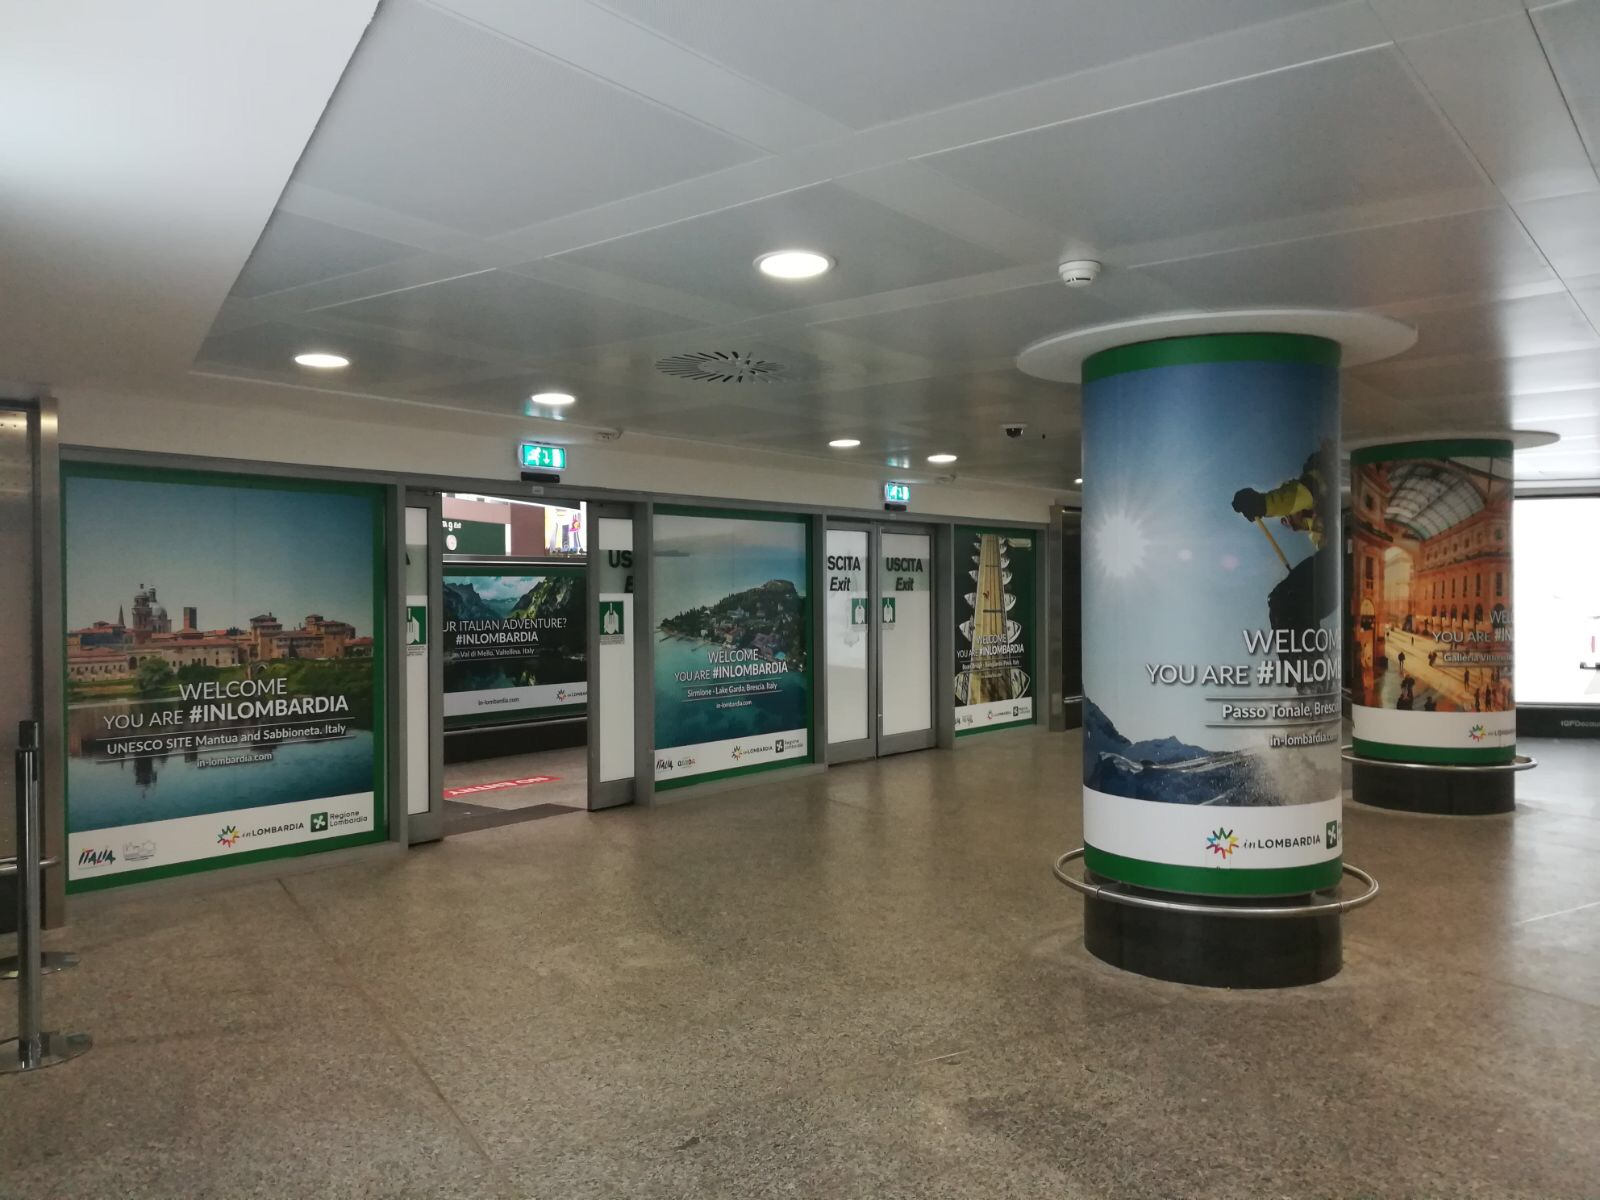 WELCOME… #inLOMBARDIA agli arrivi di Malpensa